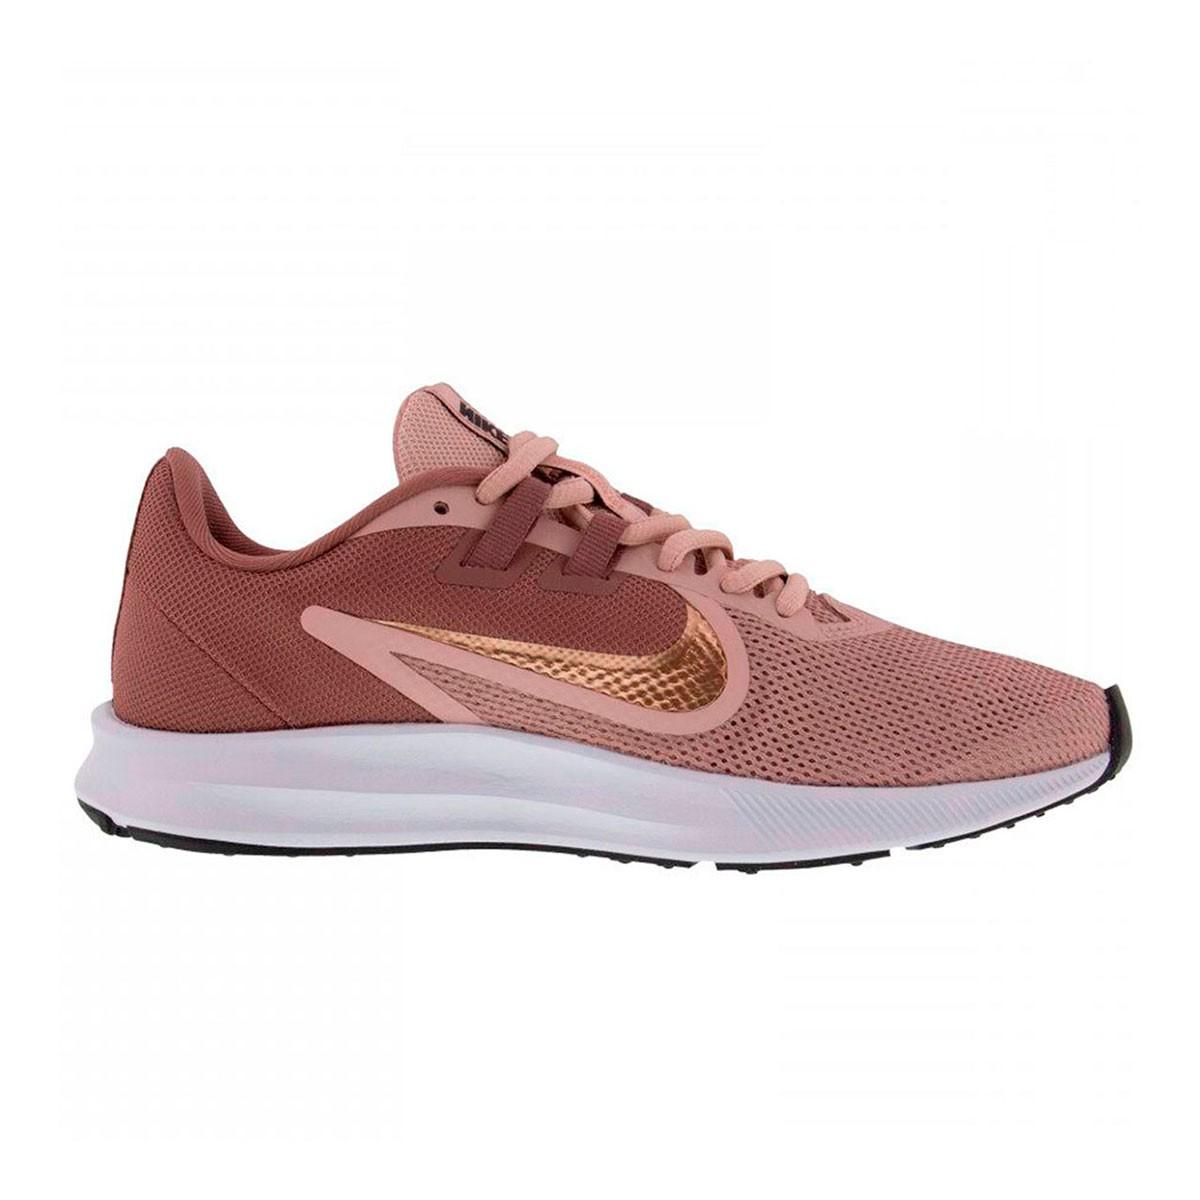 Tênis Nike Downshifter 9 GS Feminino Rosa